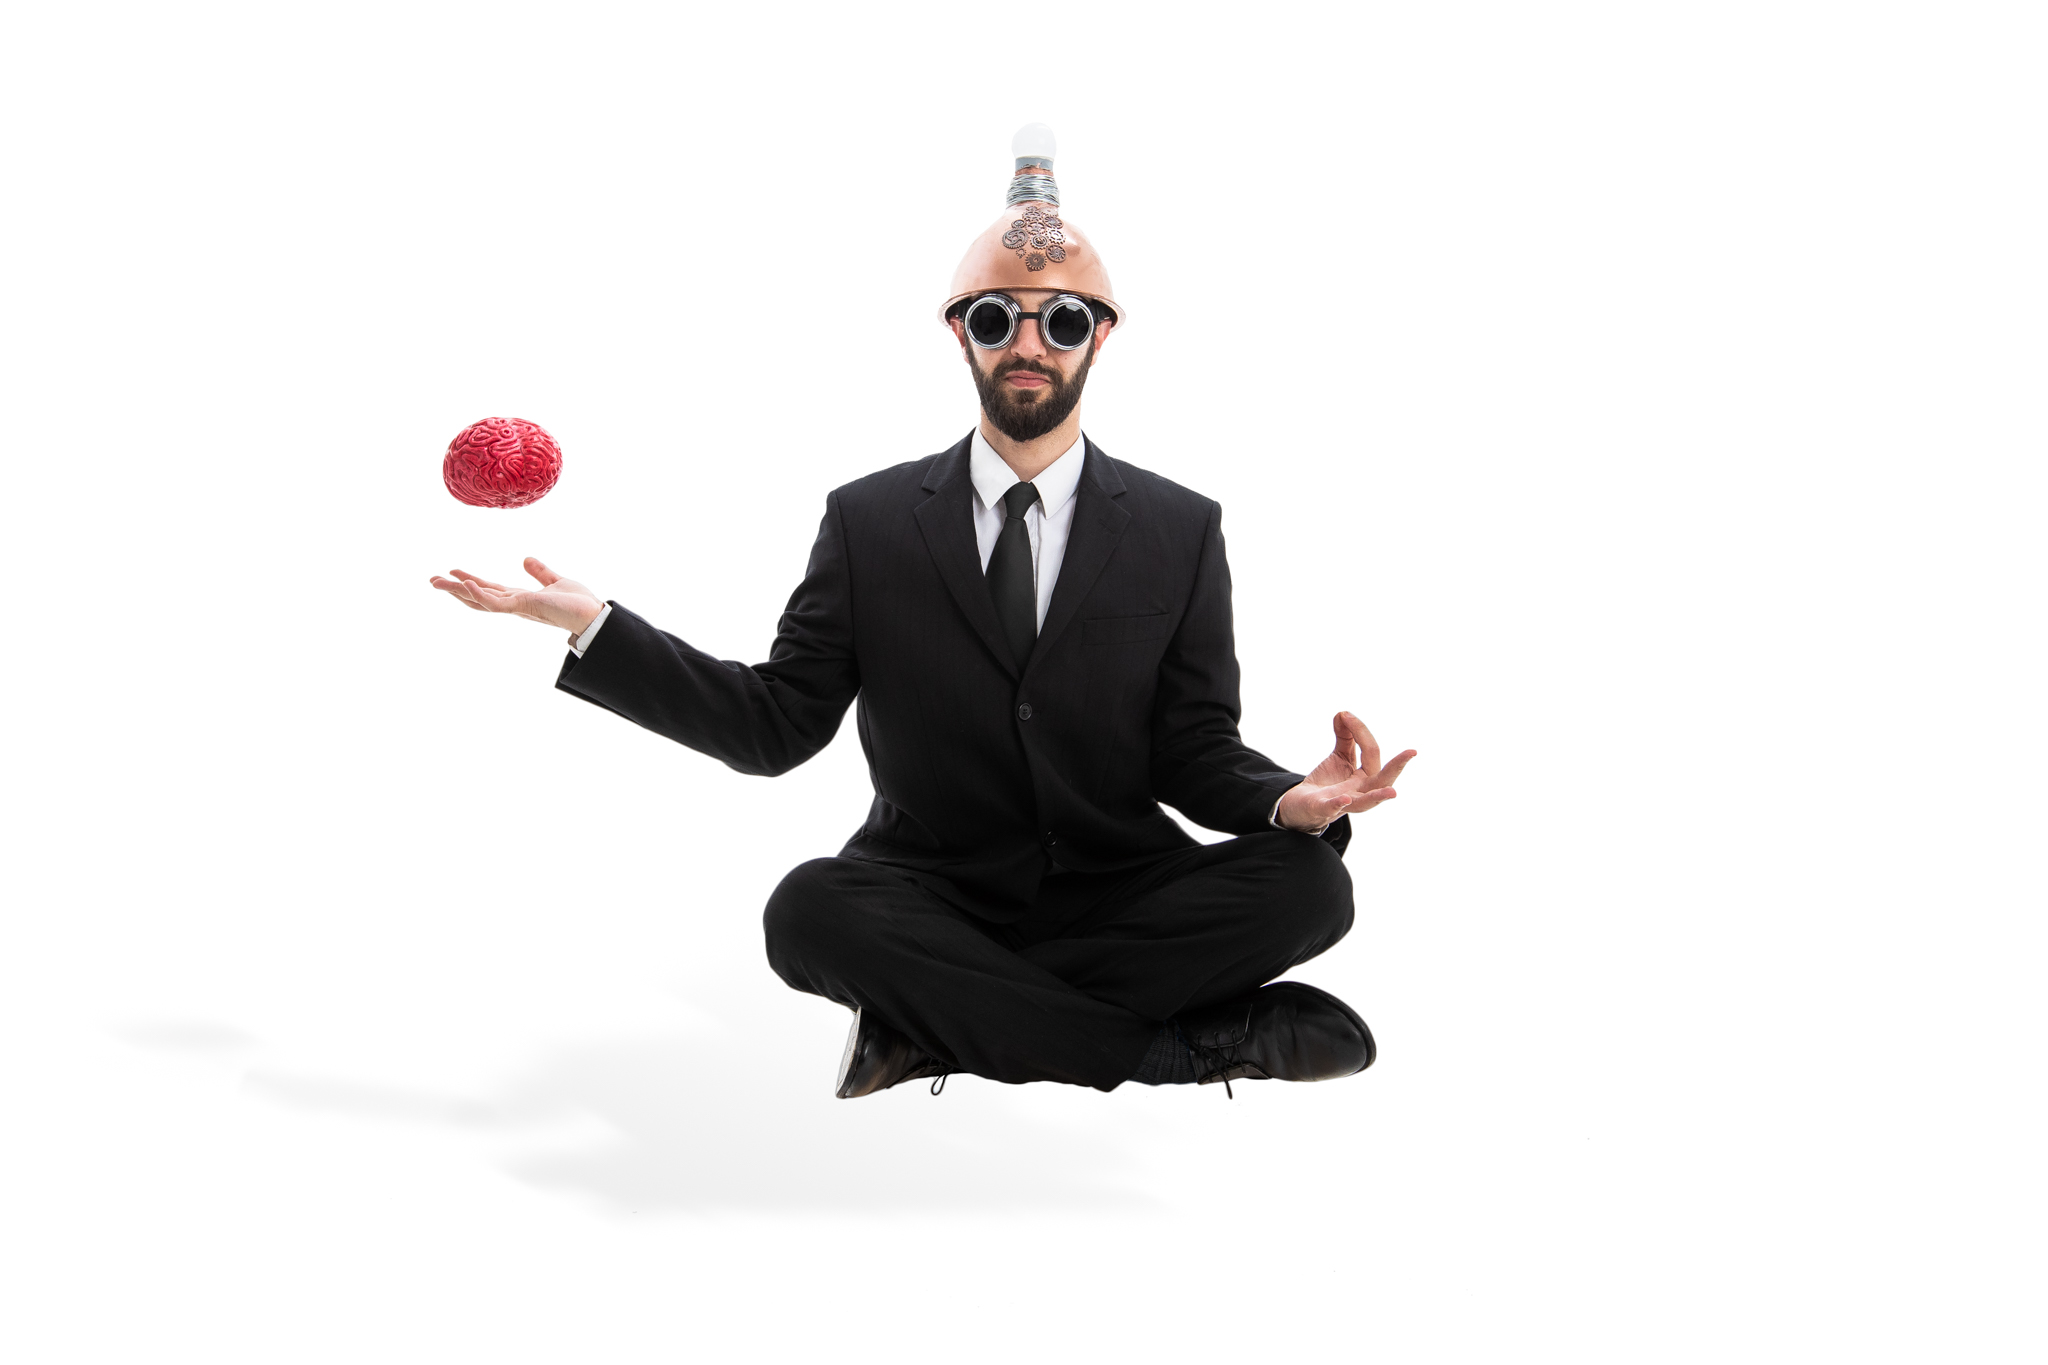 BG 30 April00159 yogo and floating brain.jpg